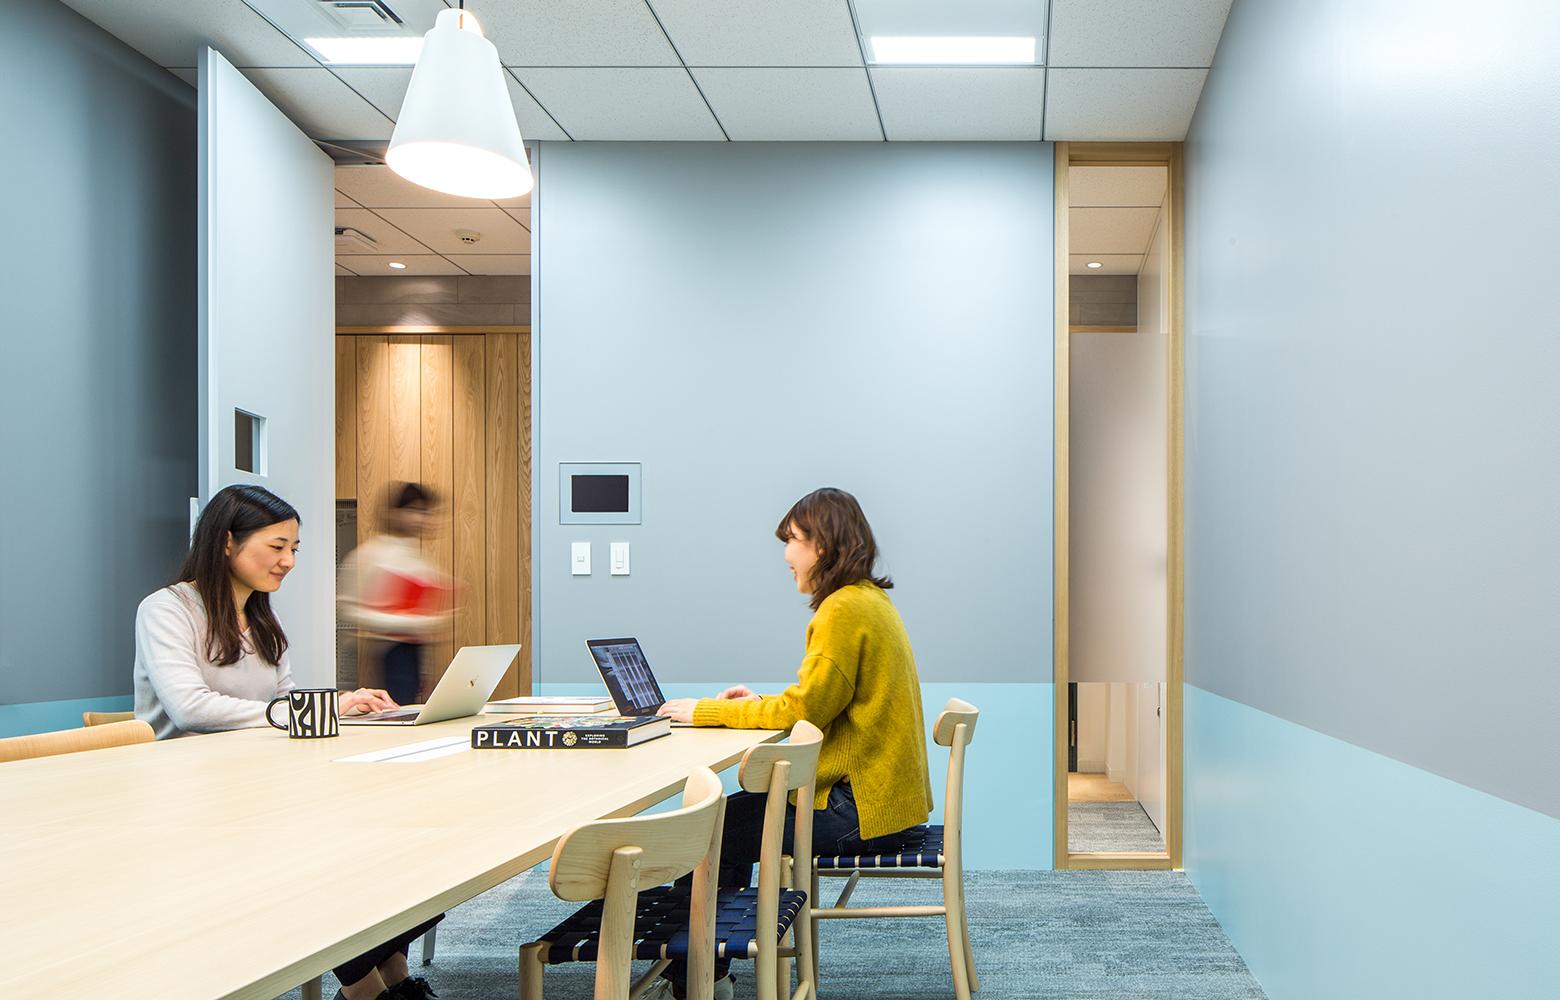 KLab株式会社 Roppongi Office Meeting Room_4 デザイン・レイアウト事例